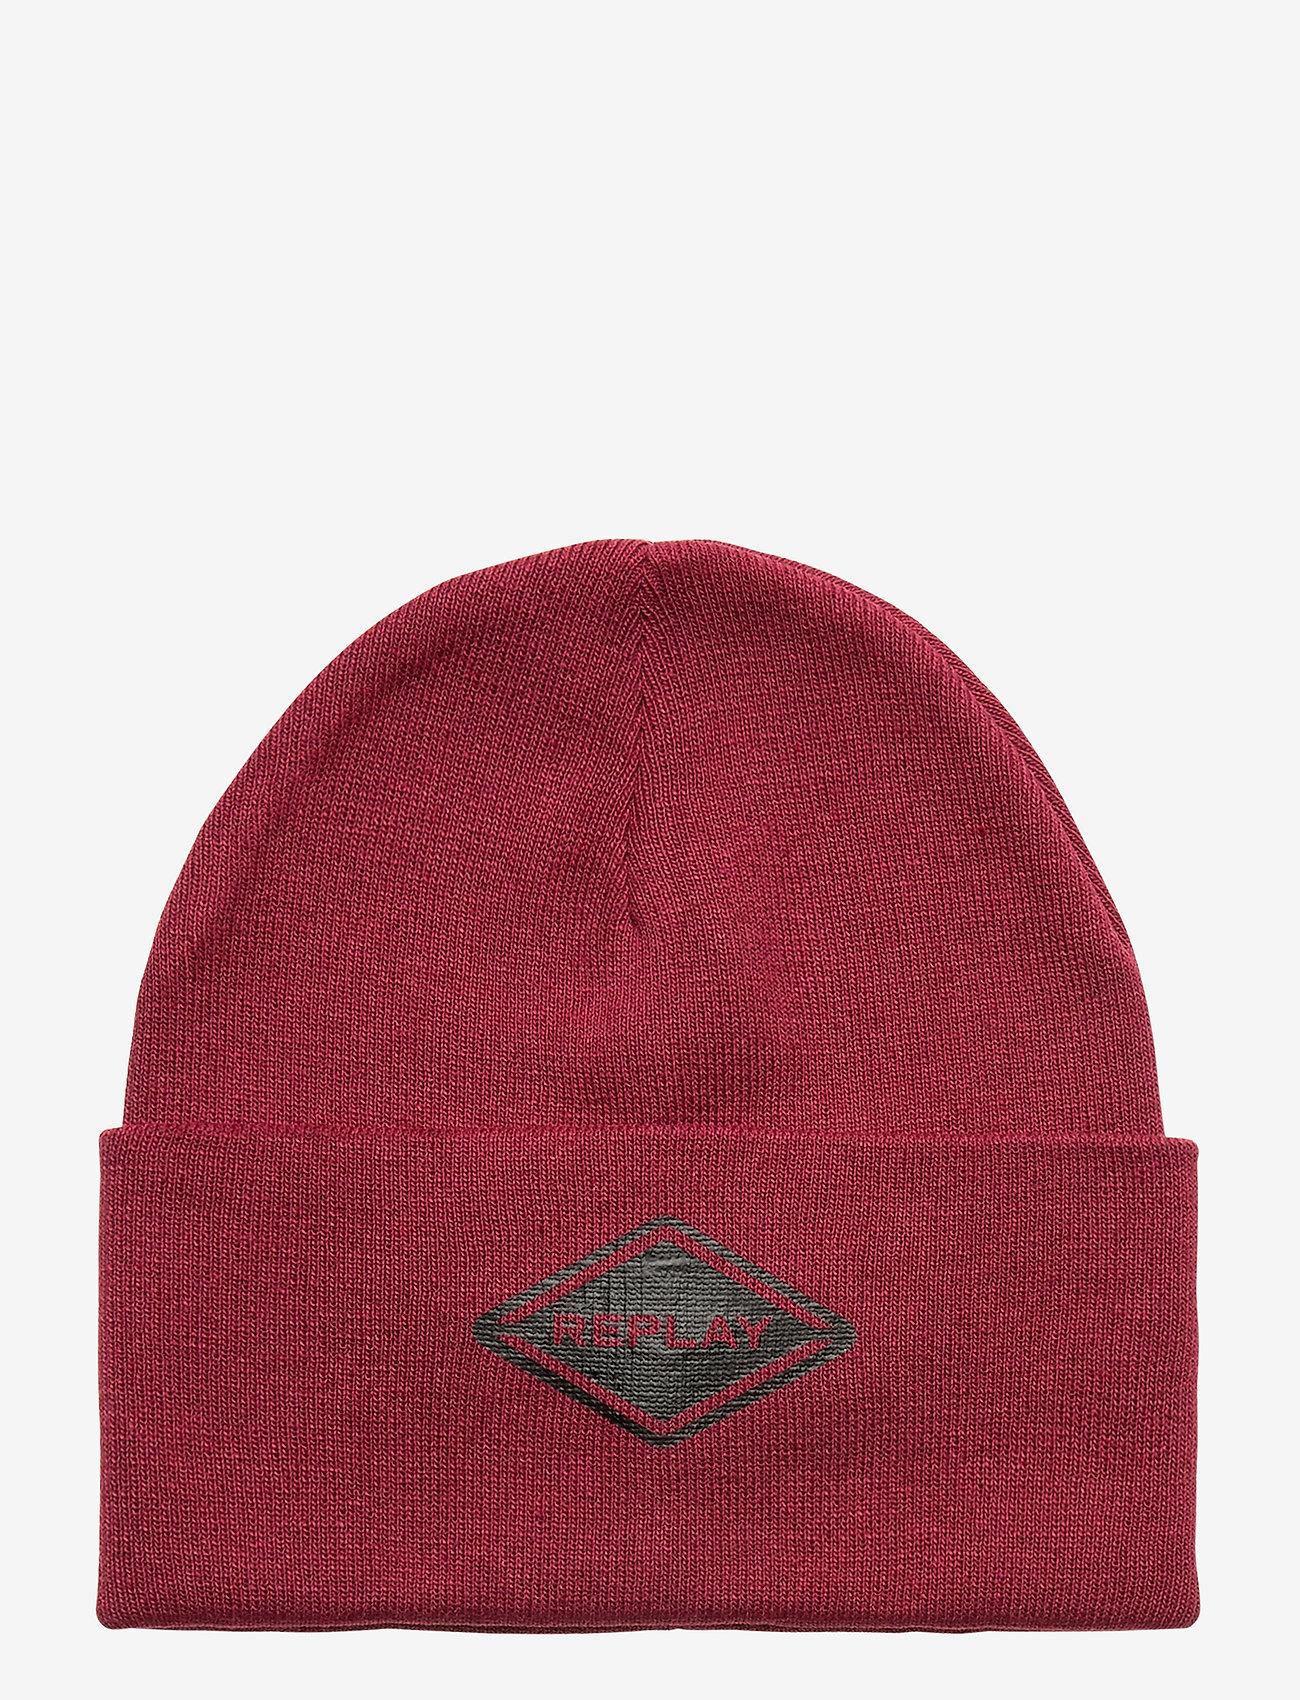 Replay - Cap - chapeaux - red purple - 0